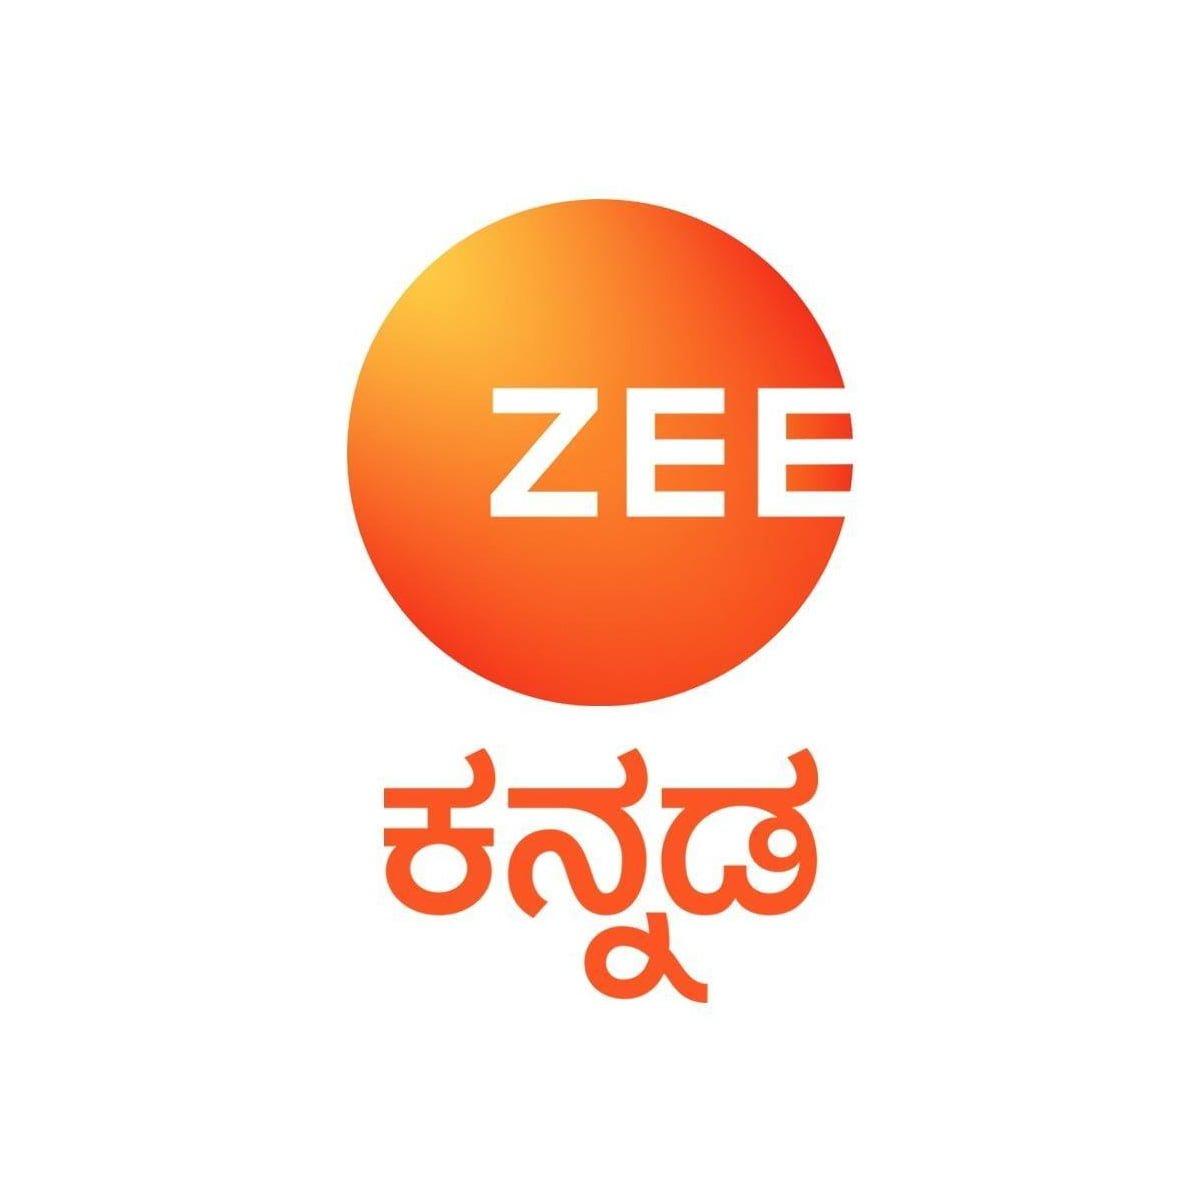 Zee Kannada's Sa Re Ga Ma Pa Judge Maha Guru Dr Hamsalekha sings Bye-Bye Corona, Goodbye Corona with his family